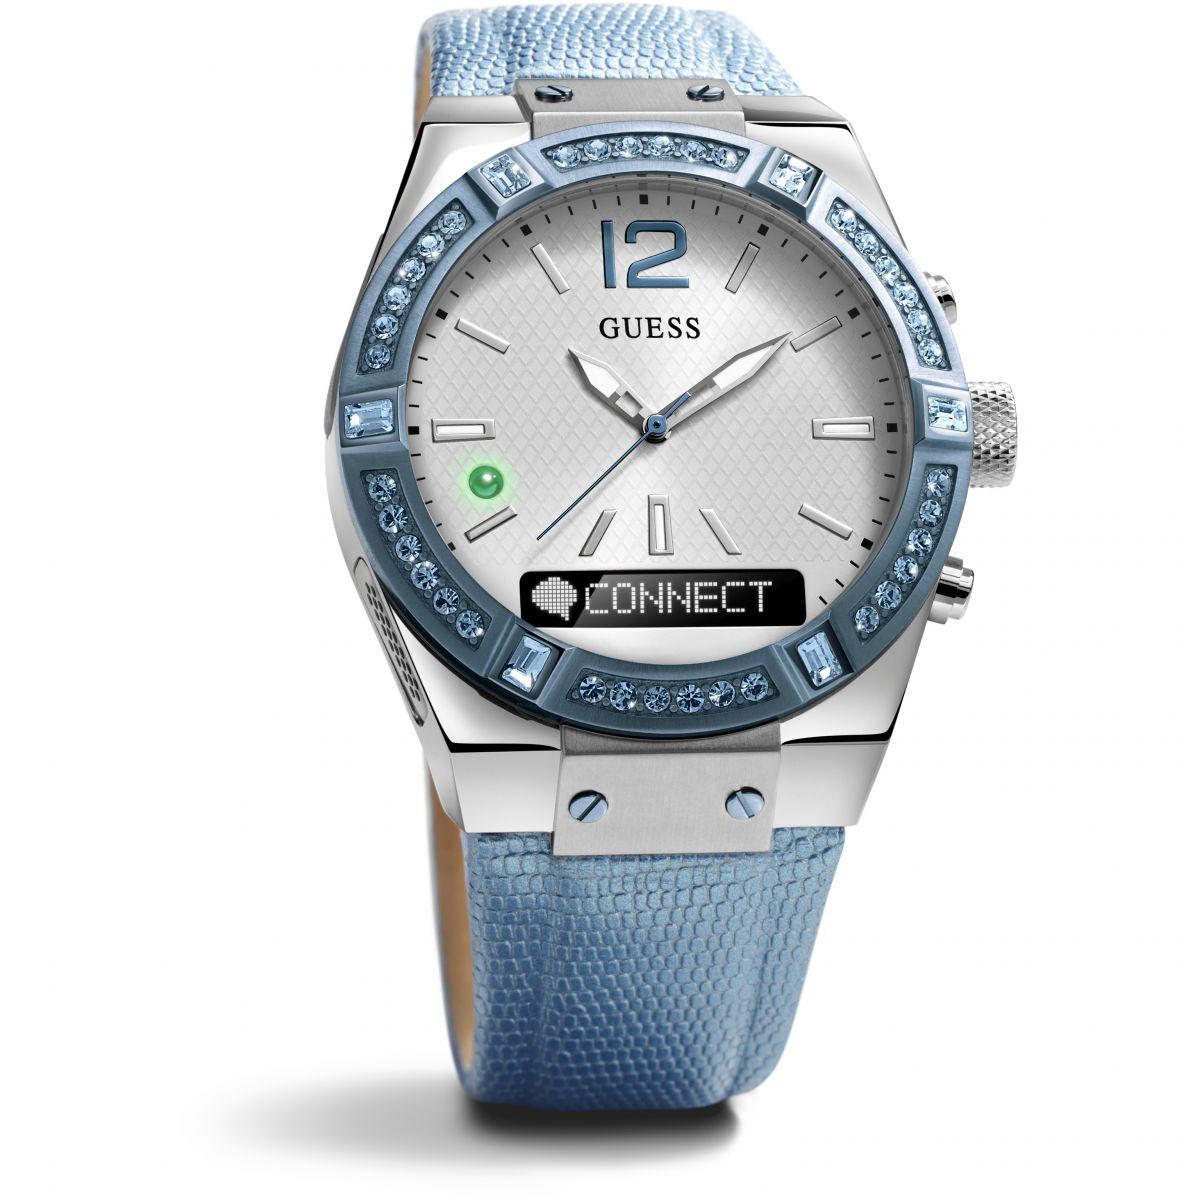 damen guess connect bluetooth hybrid smartwatch uhren c0002m5. Black Bedroom Furniture Sets. Home Design Ideas